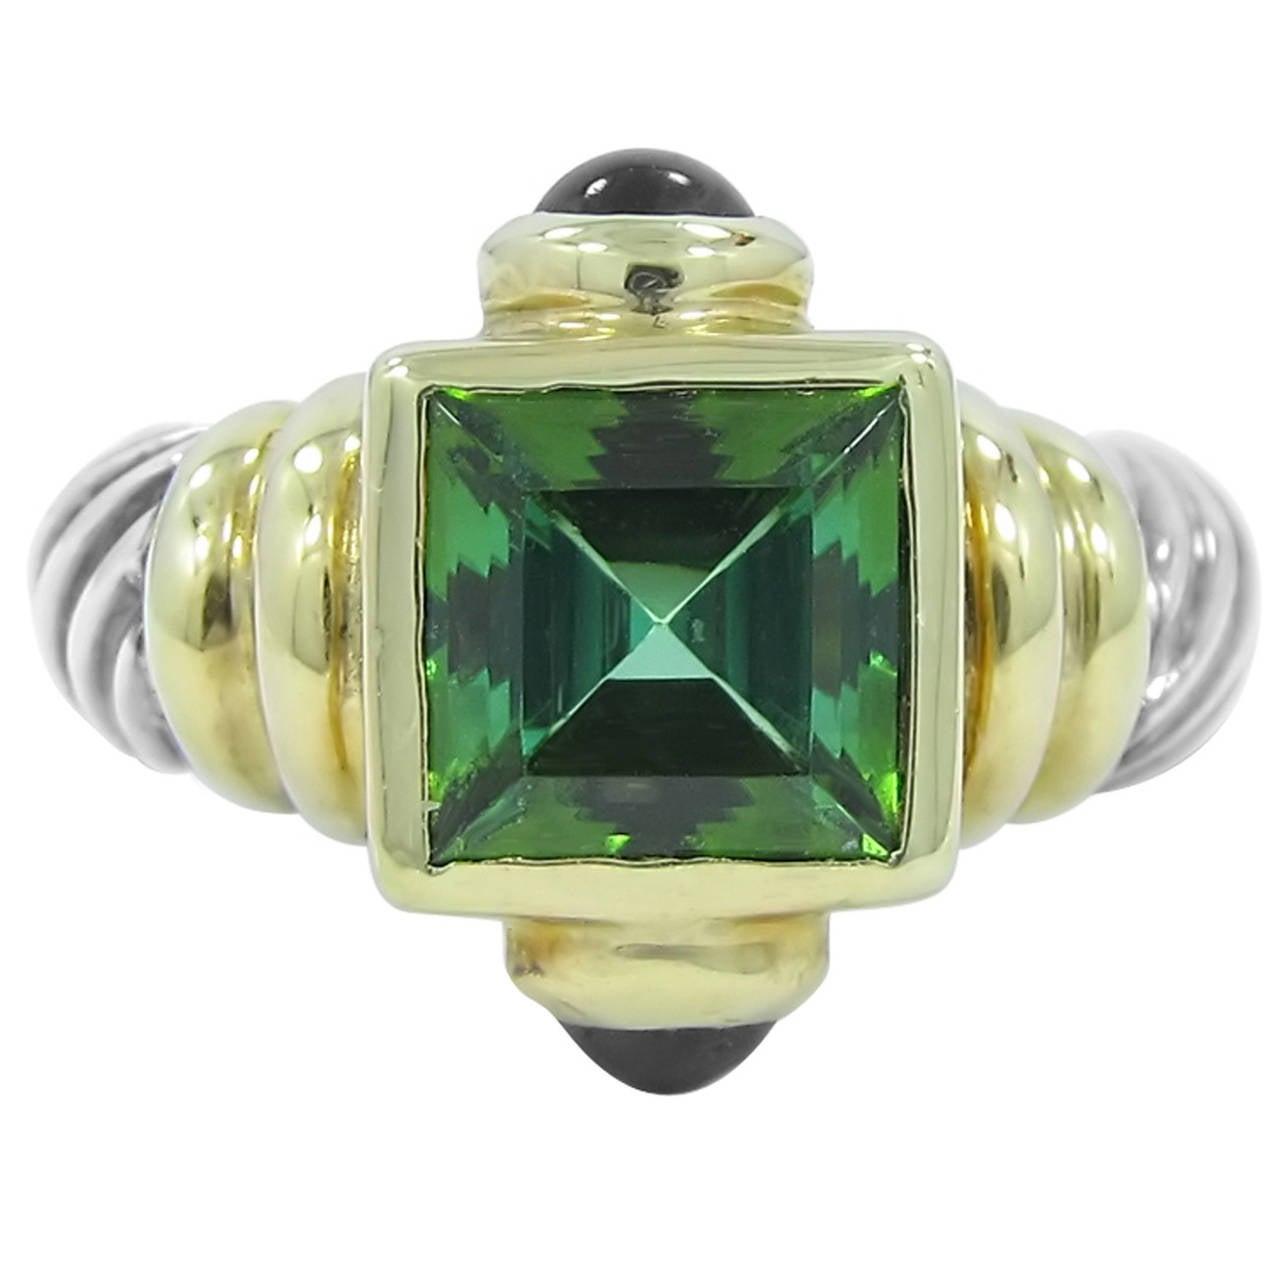 david yurman green tourmaline amethyst silver gold ring. Black Bedroom Furniture Sets. Home Design Ideas